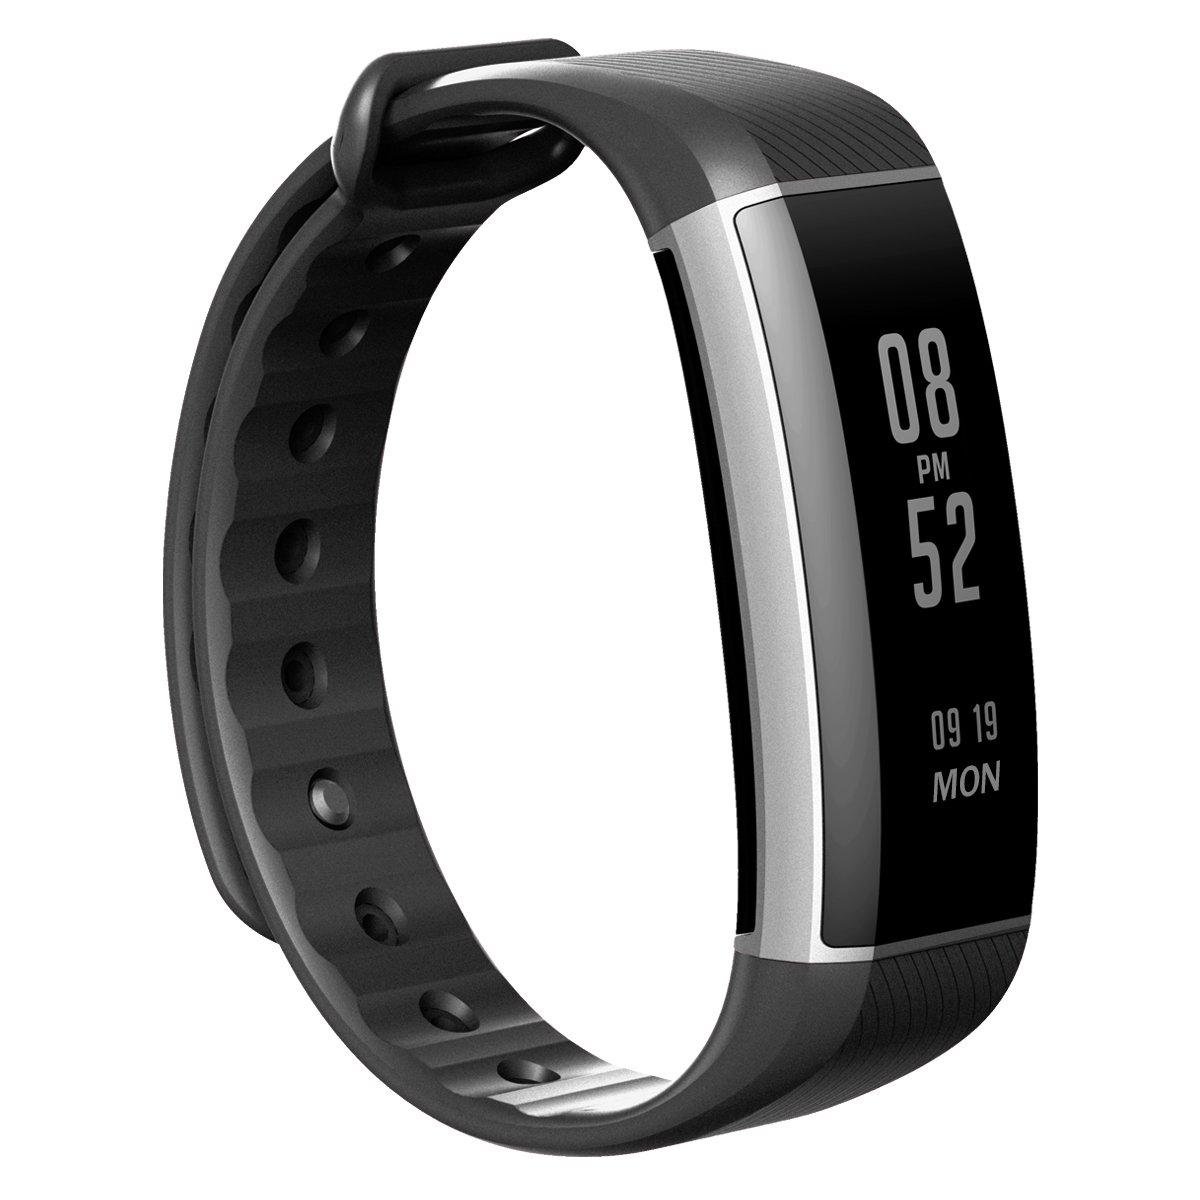 Zeband Plus Smart Sports Bracelet Heart Rate Monitor Pedometer Sleep BT 4.0 IP67 - Black